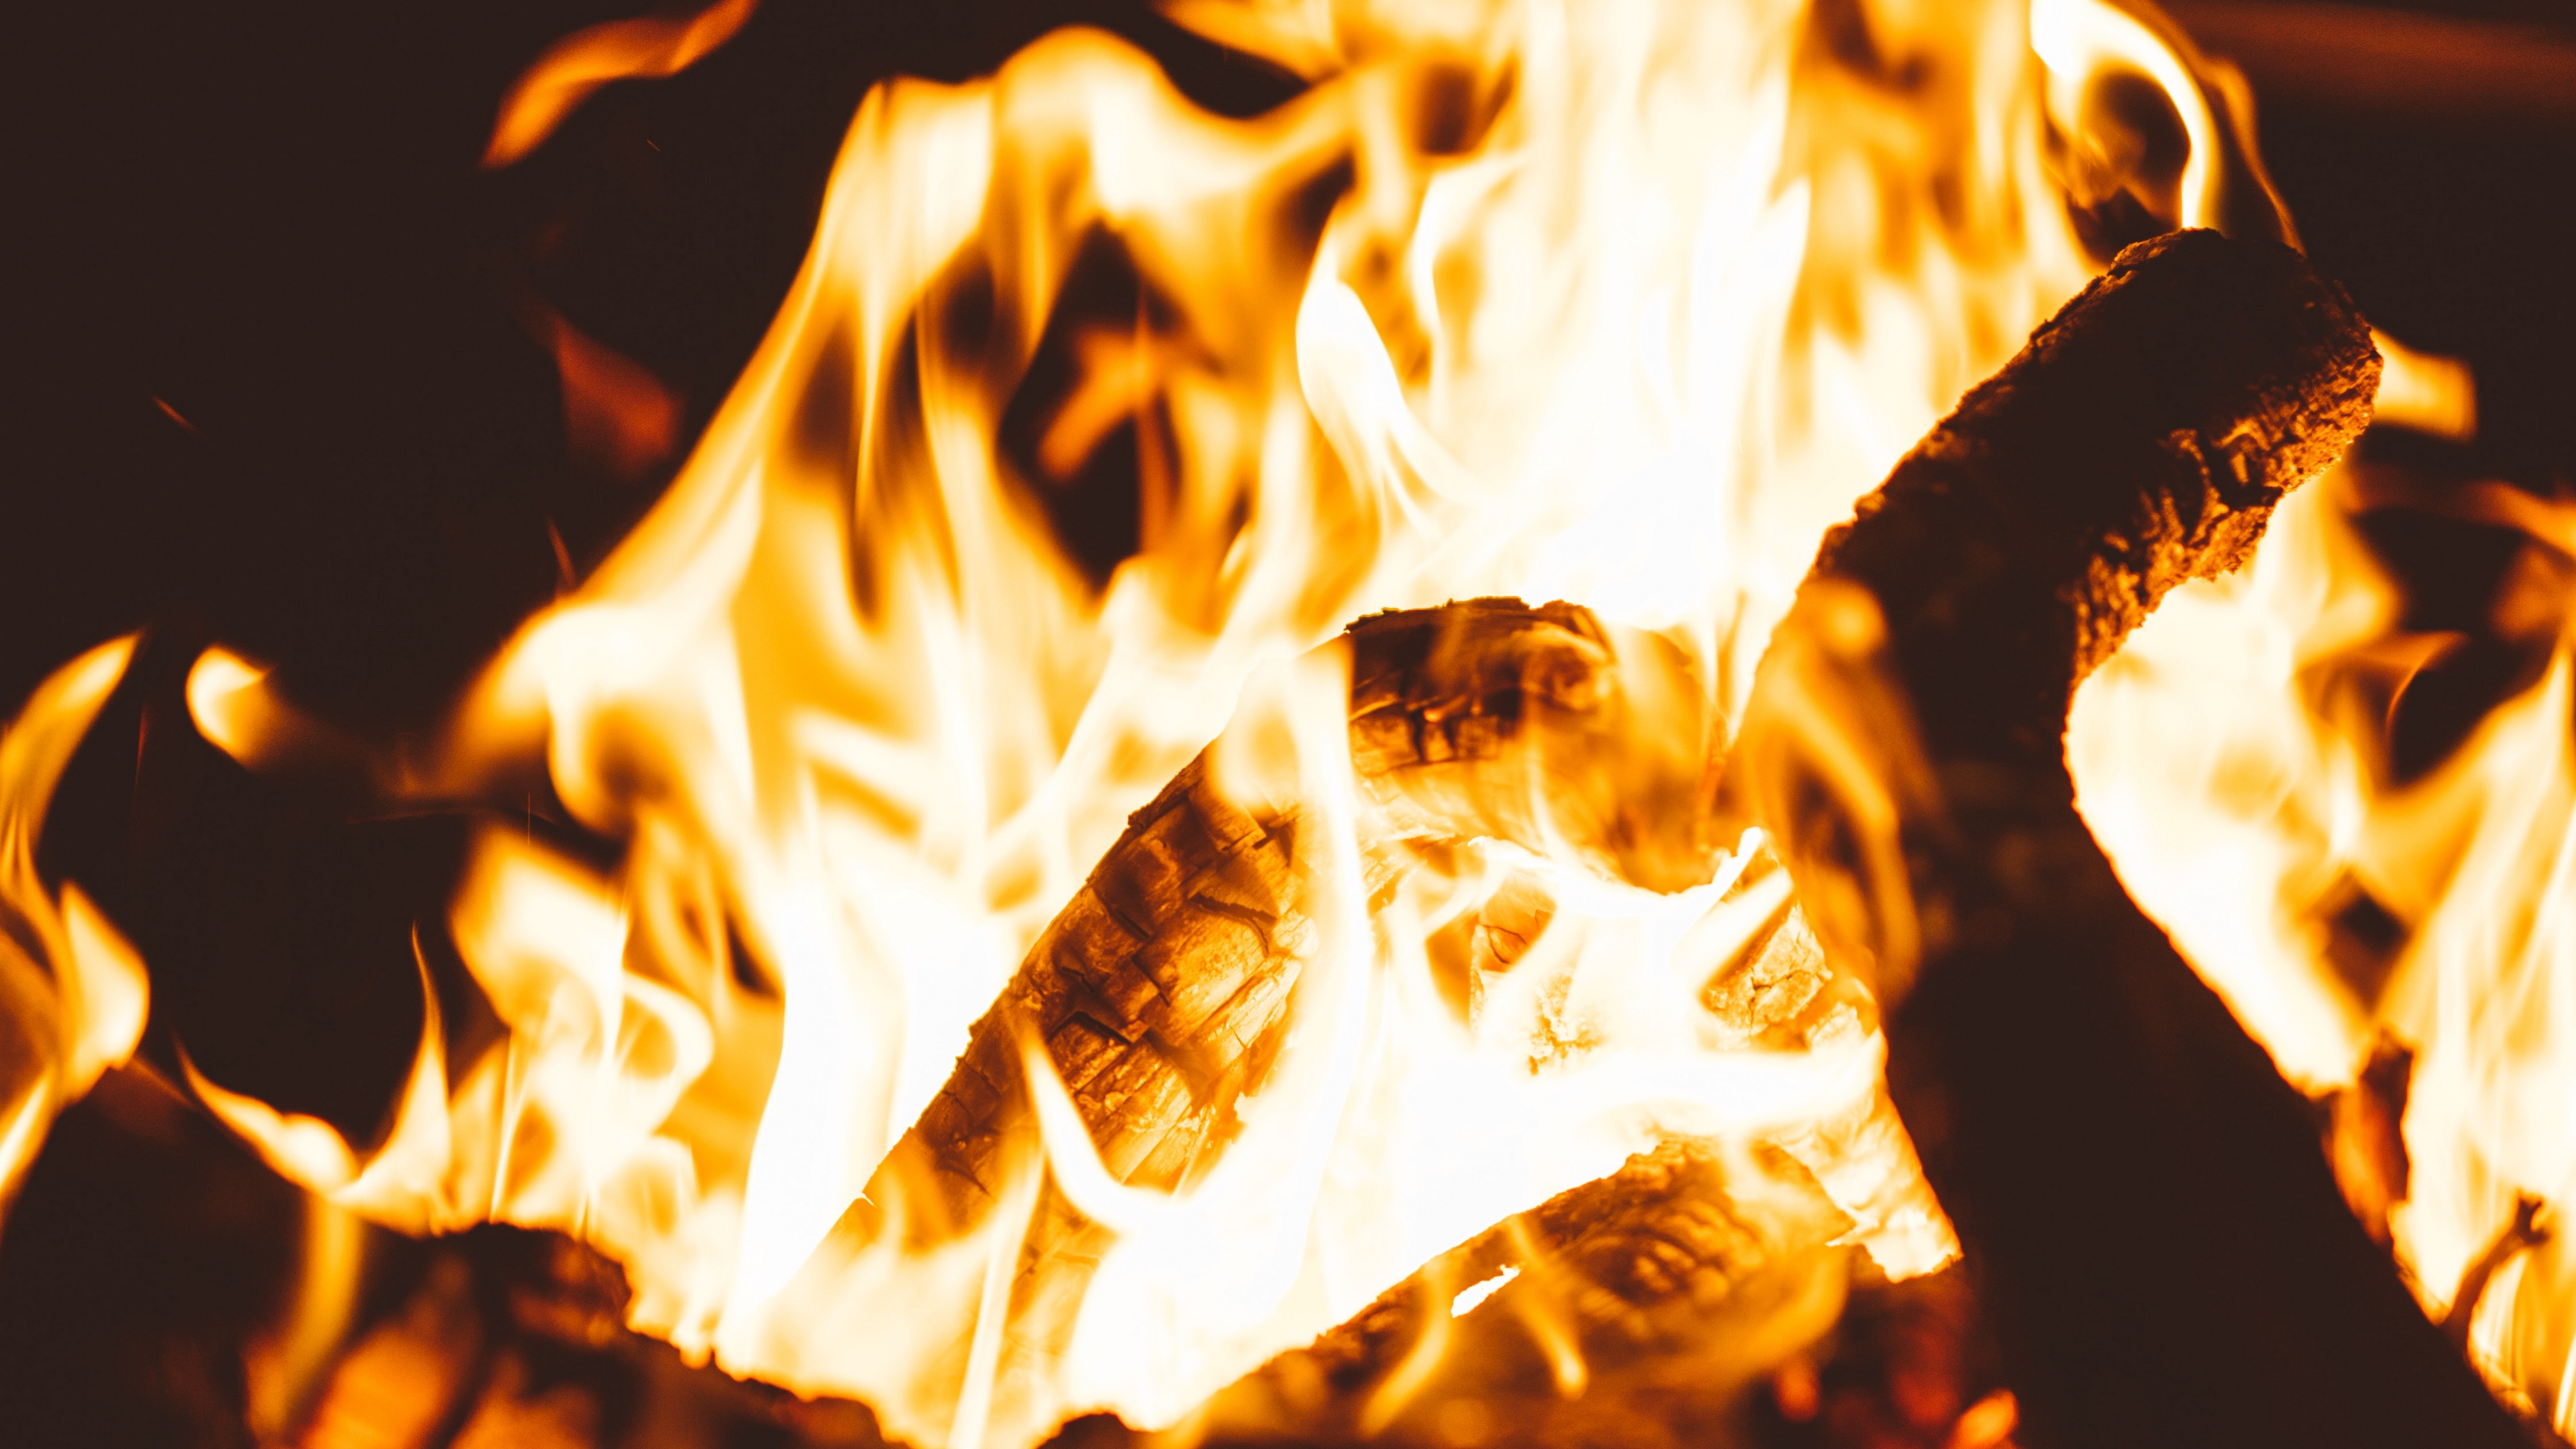 bonfire fire flame firewood dark blur 4k 1540575227 - bonfire, fire, flame, firewood, dark, blur 4k - flame, Fire, bonfire